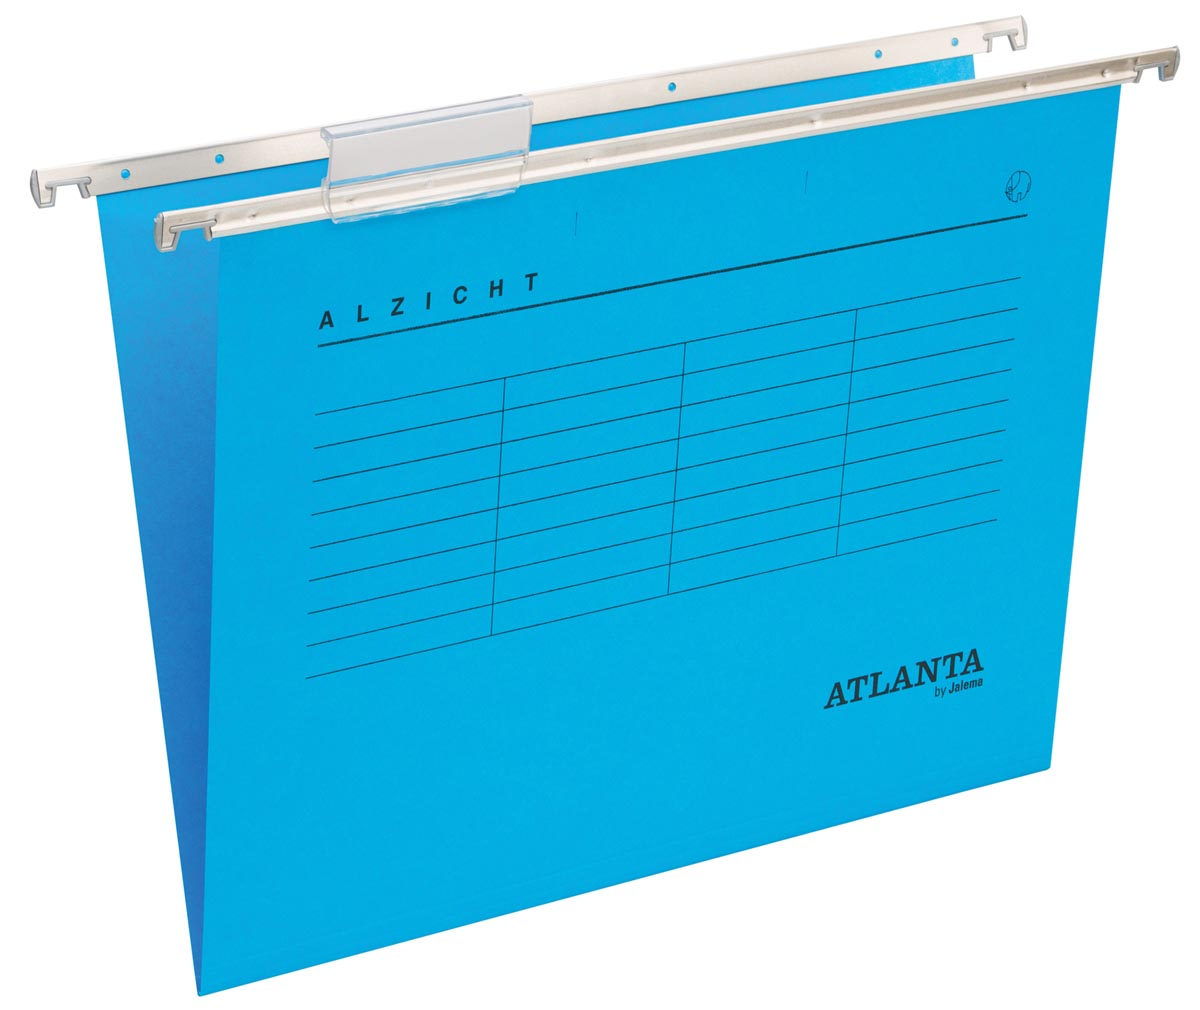 Atlanta hangmappen Alzicht Spectrum ft folio, V-bodem, blauw